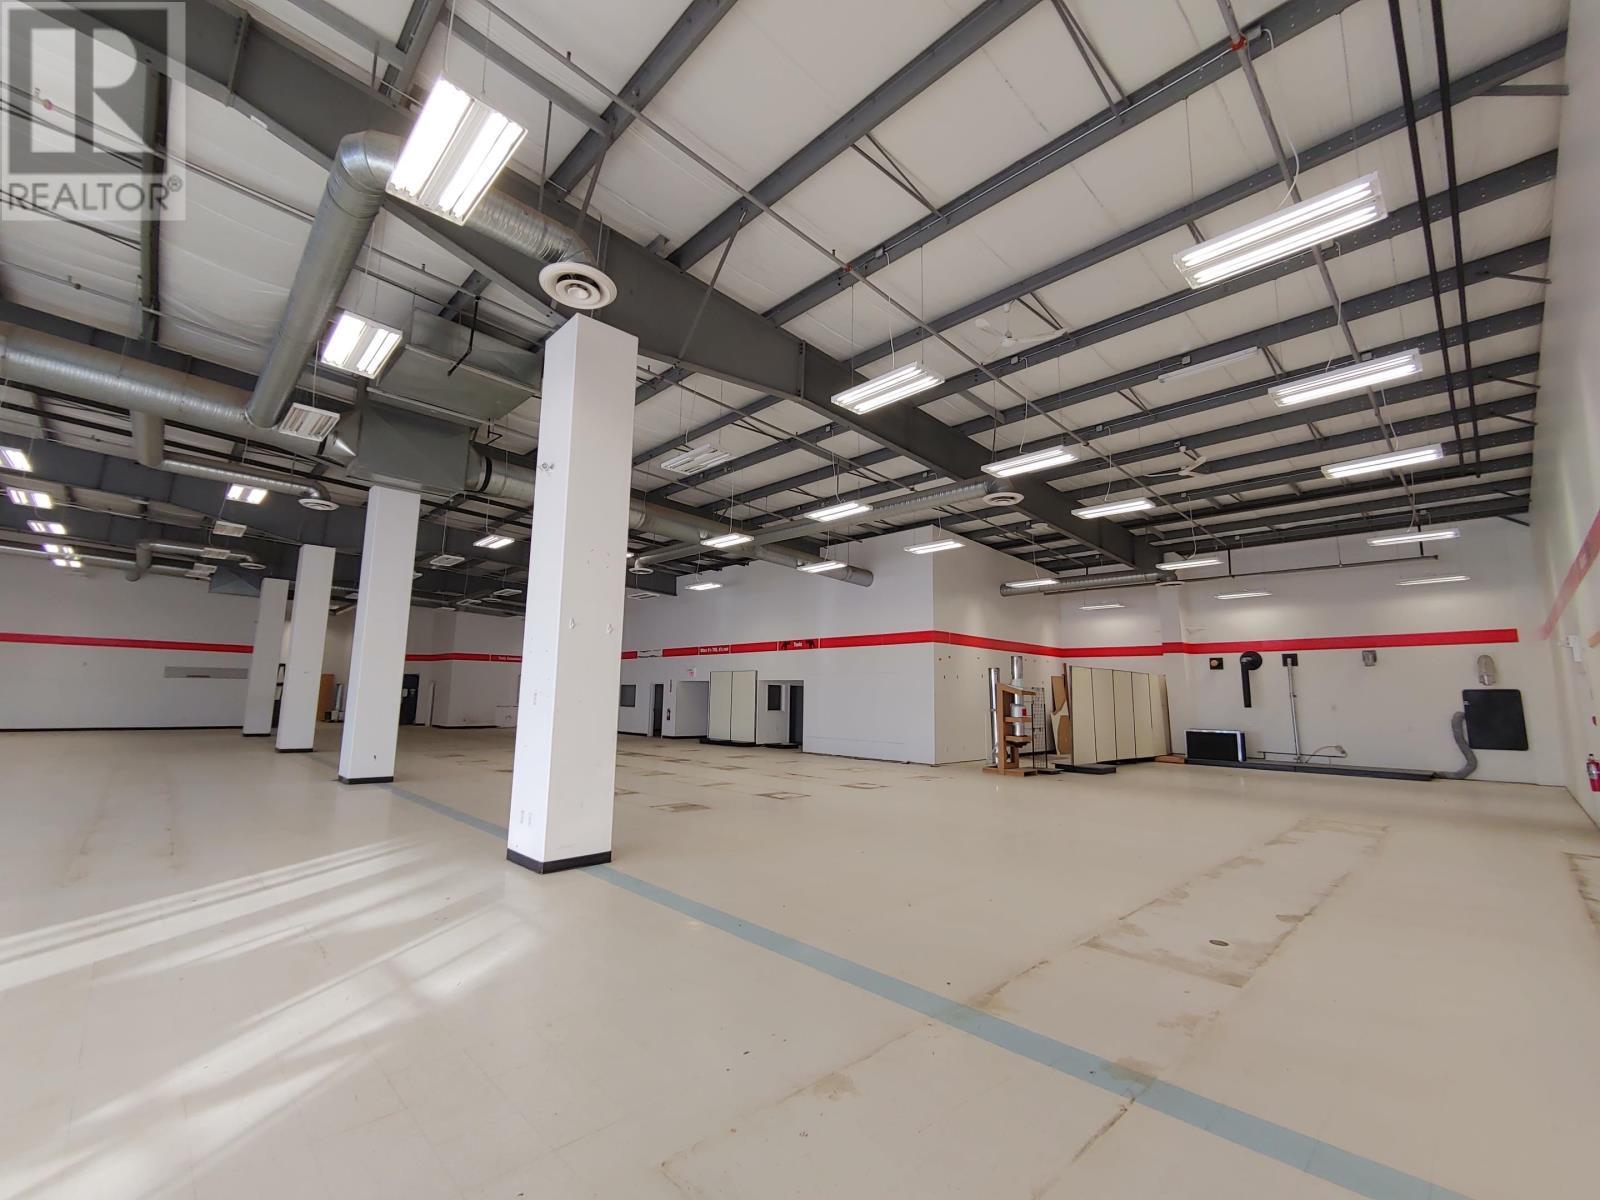 10020 93 Avenue, Fort St. John (Zone 60), British Columbia  V1J 5J5 - Photo 1 - C8027532